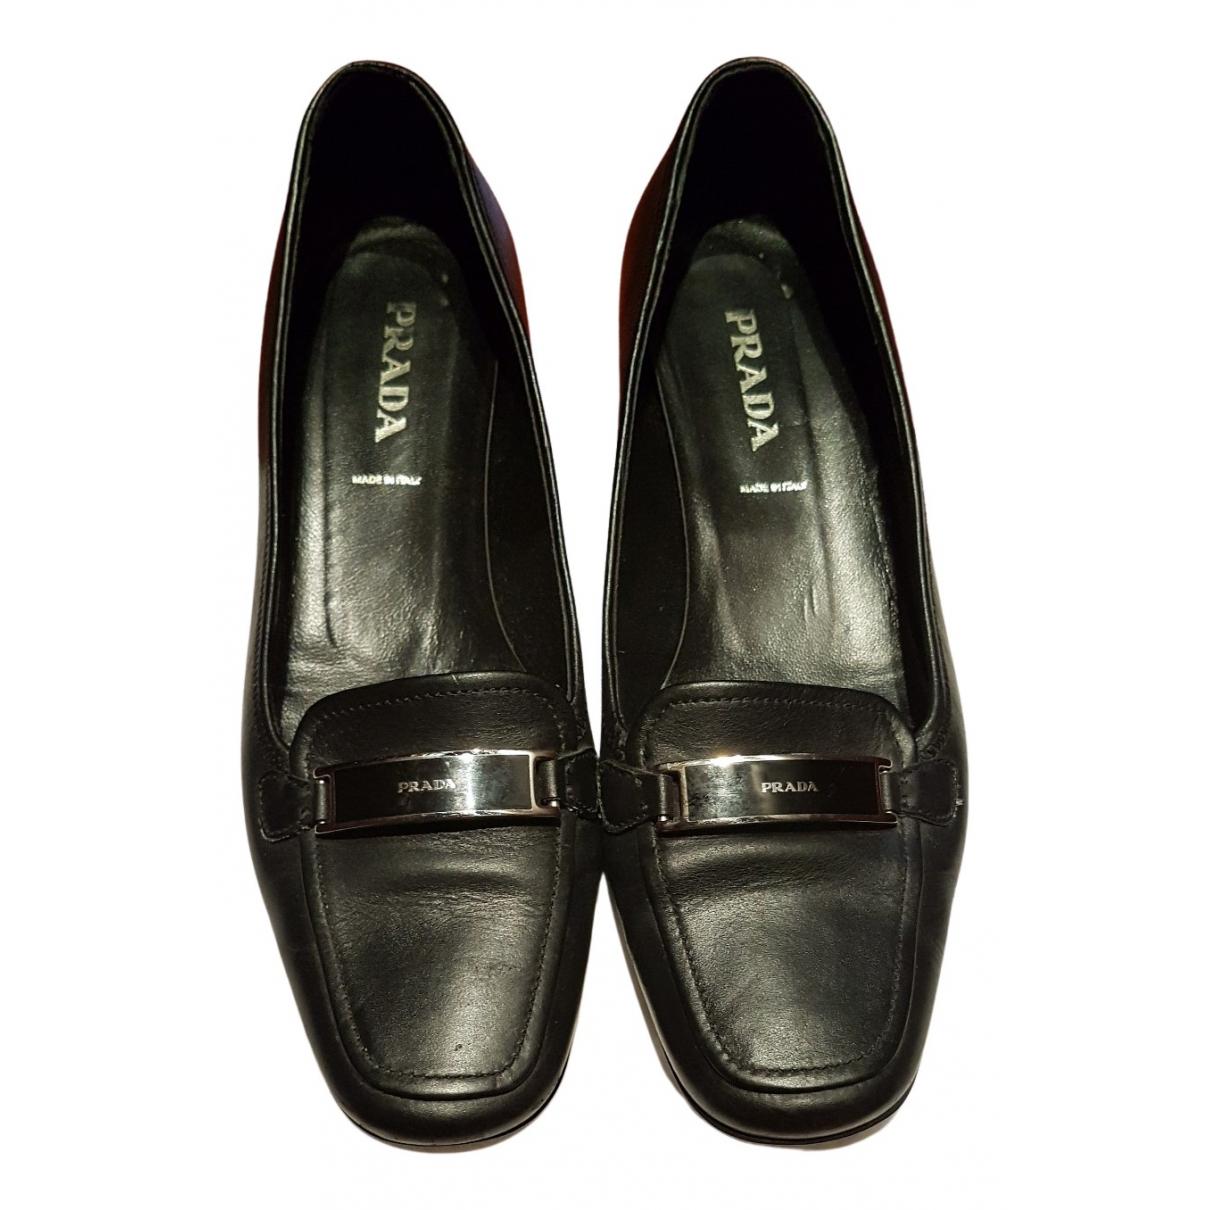 Prada N Black Leather Flats for Women 38.5 EU